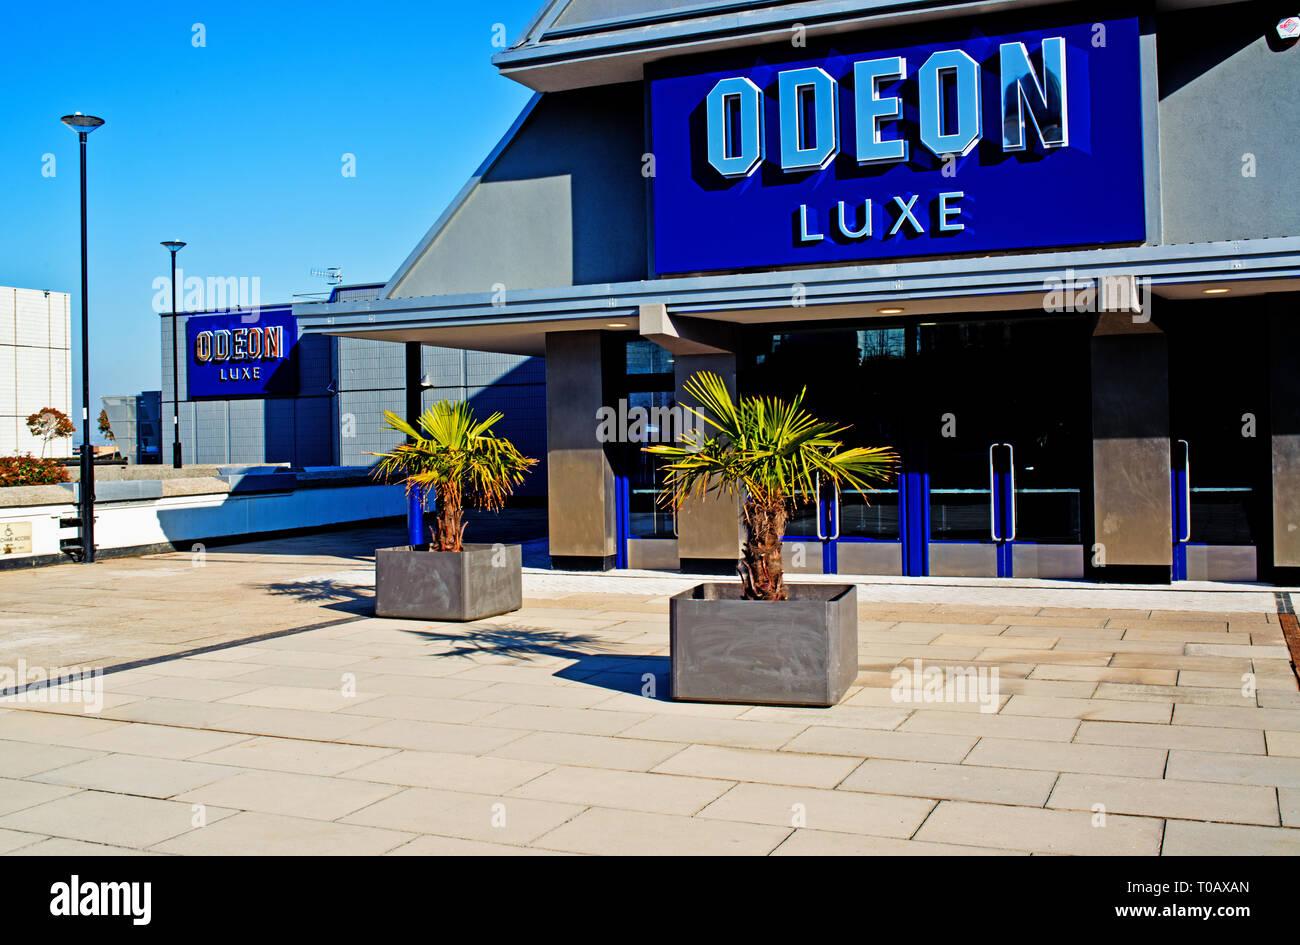 Sheffield,Odeon Luxe Cinema,  England - Stock Image